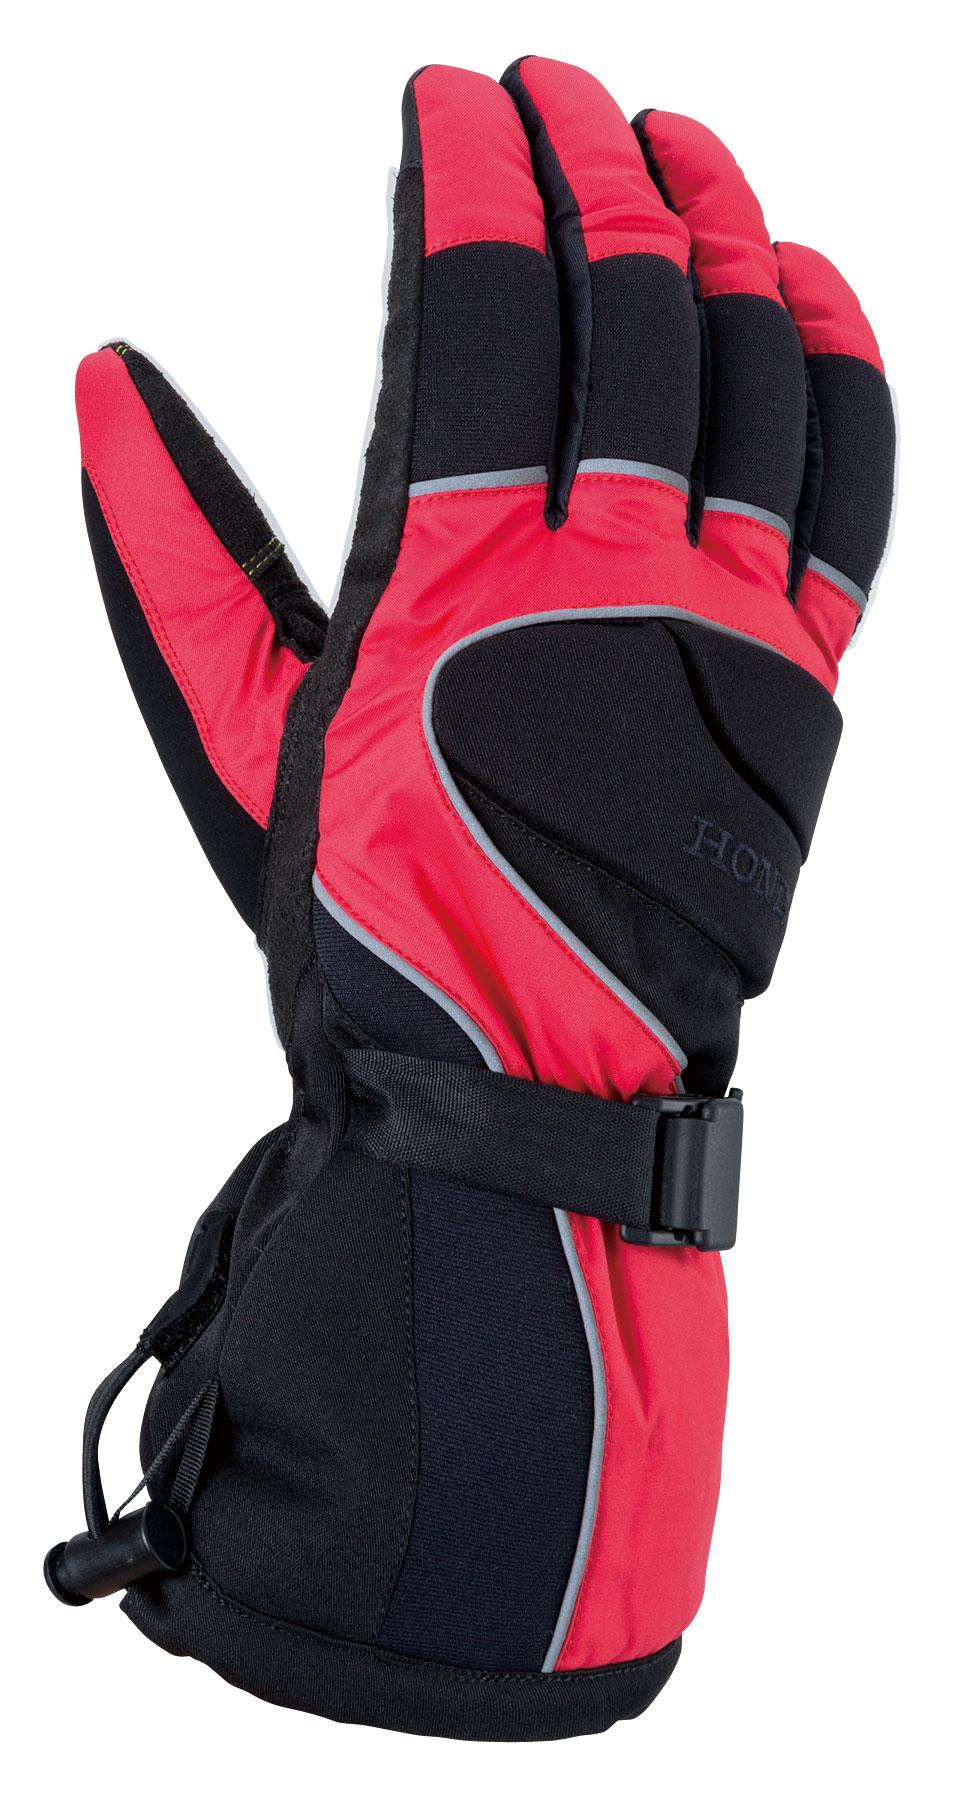 【HONDA RIDING GEAR】冬季旅行手套 - 「Webike-摩托百貨」